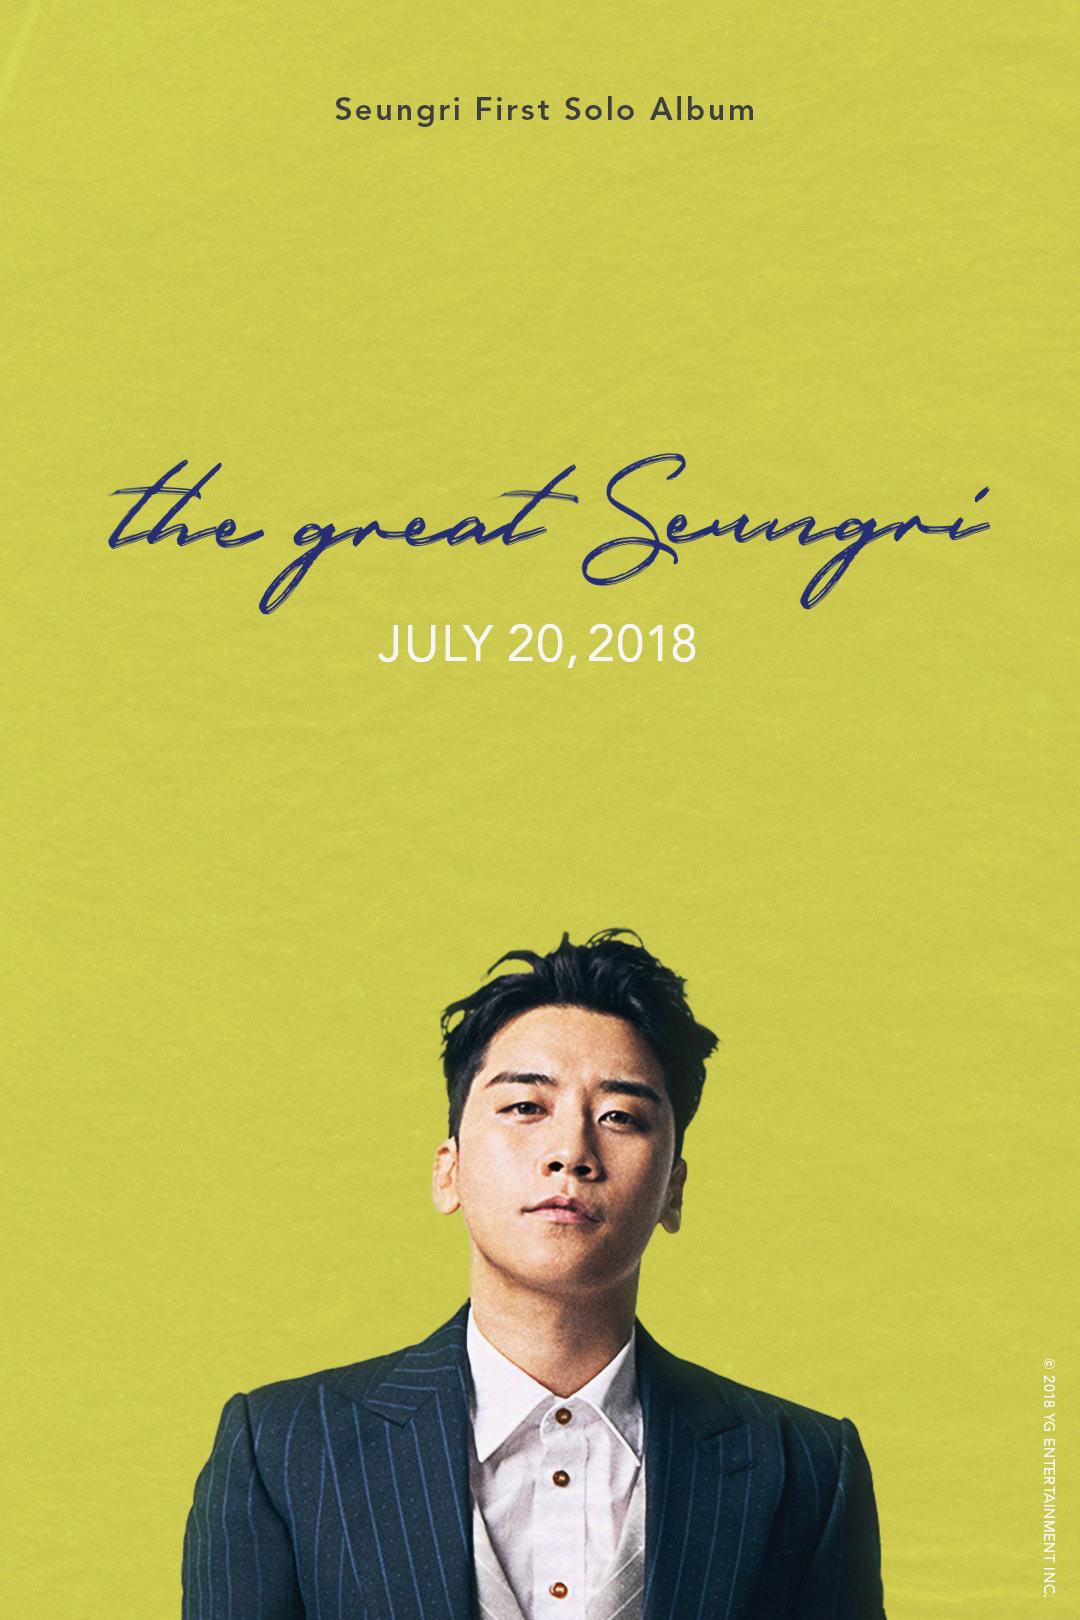 SEUNGRI_poster_title_1D_수정2